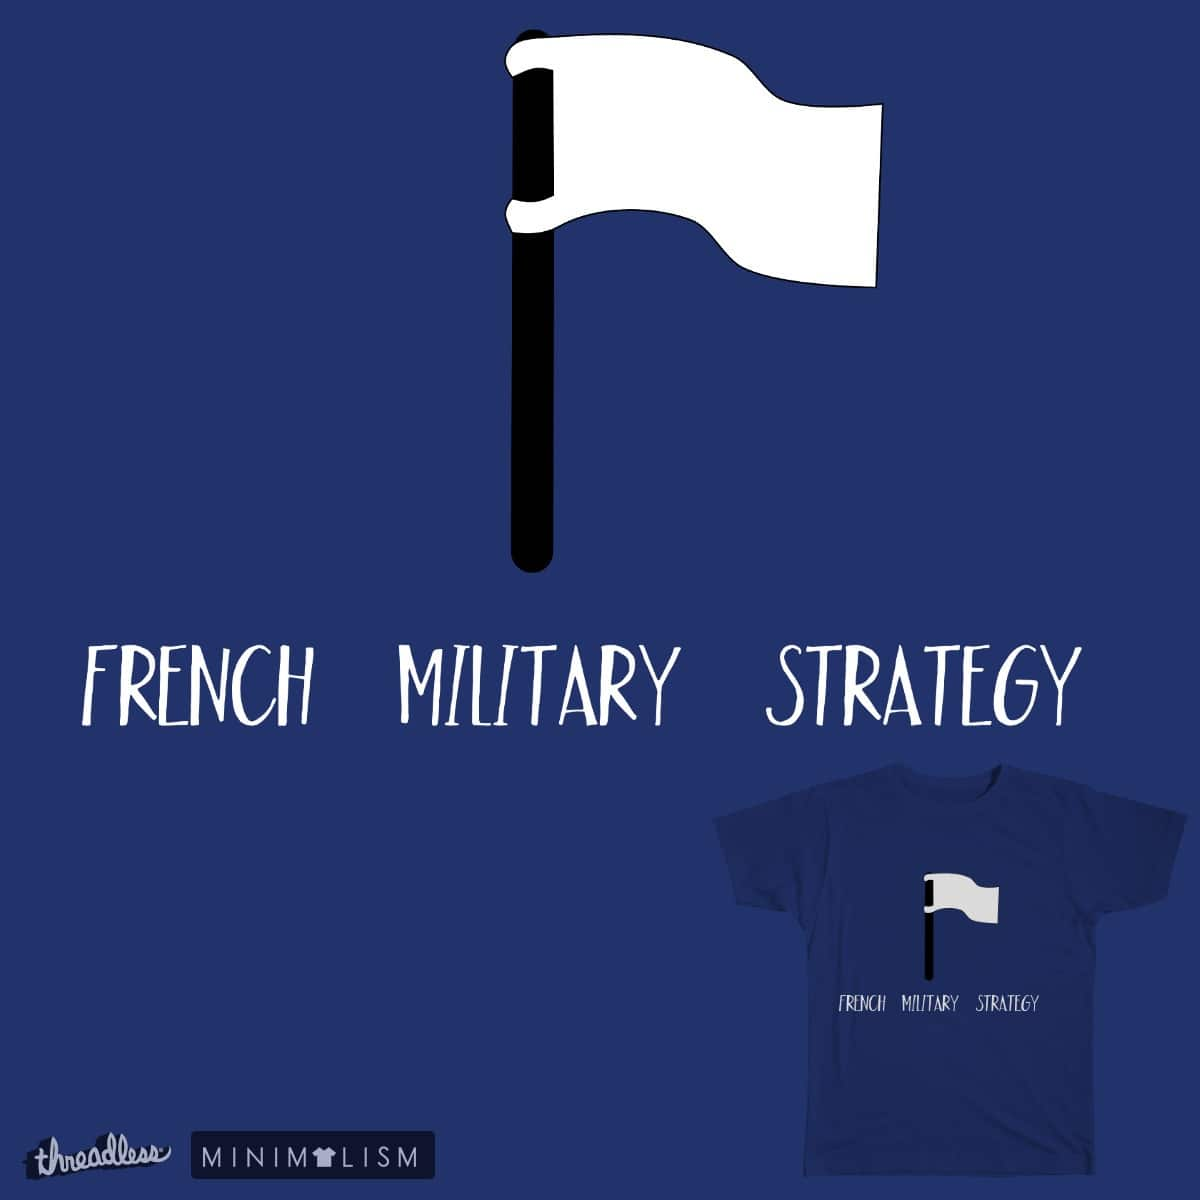 French Power by OneWeirdDude on Threadless